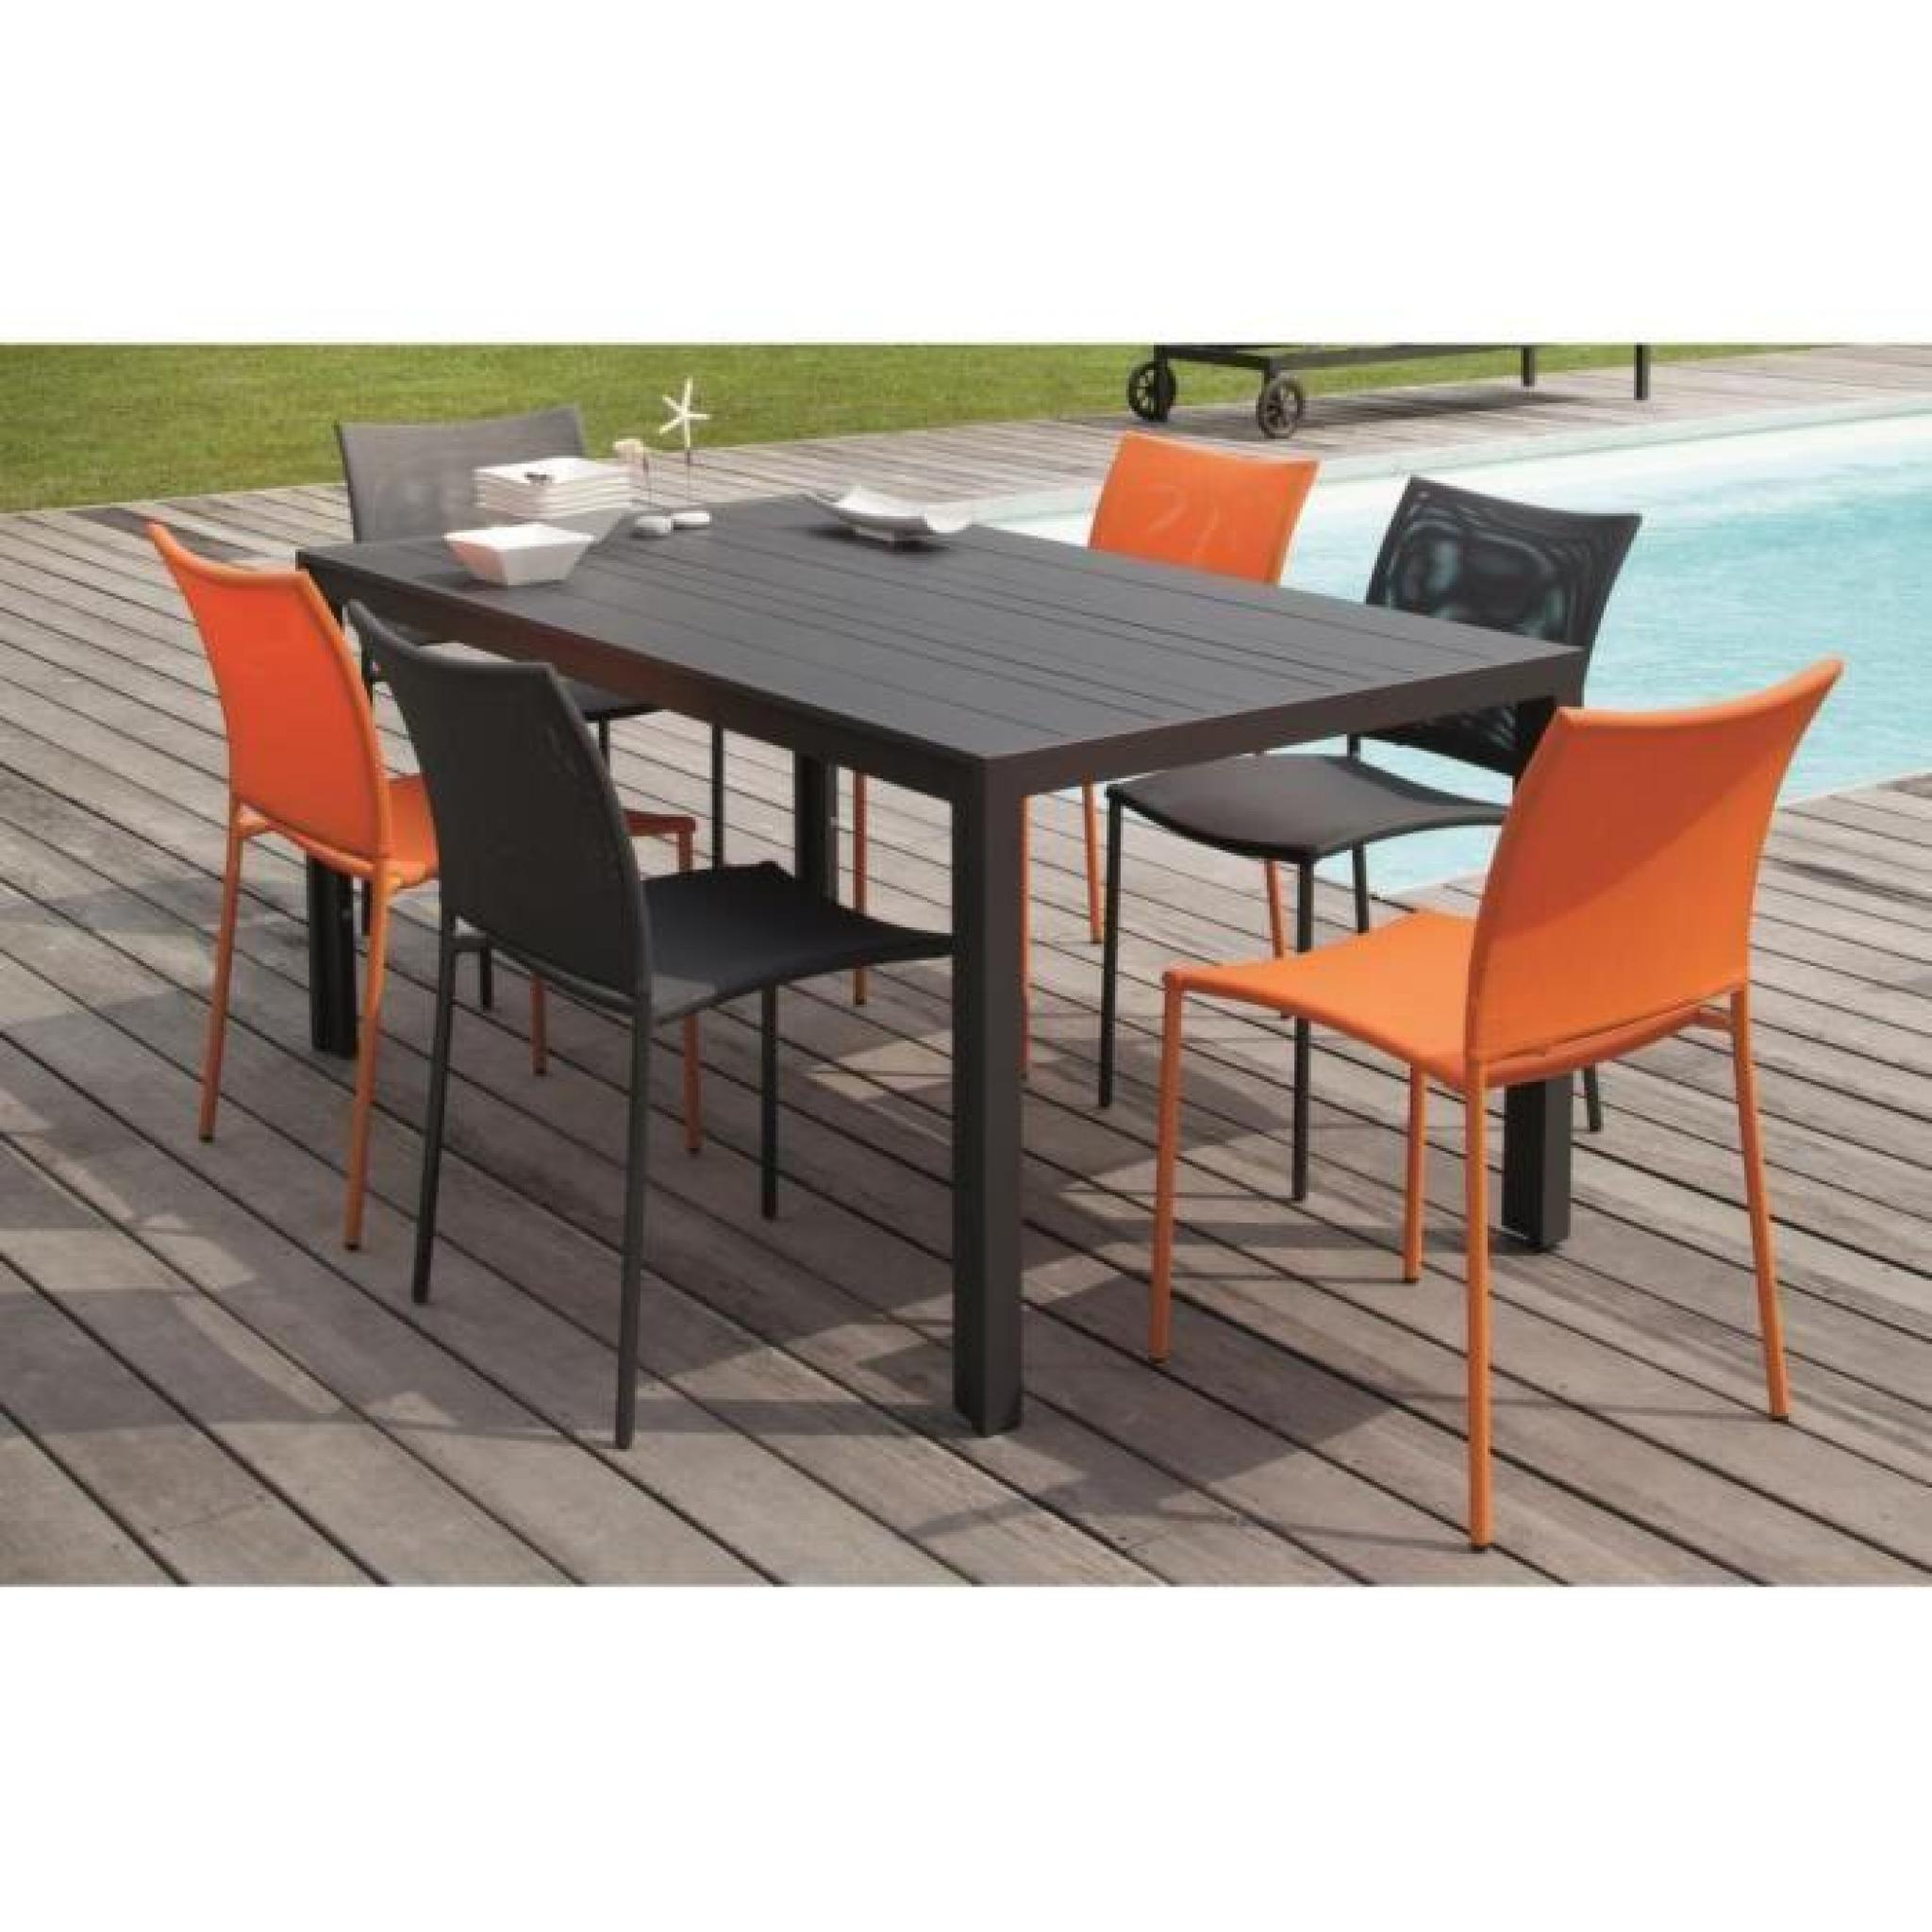 Salon Bretagne 1 table + 6 chaises orange Orange - Achat/Vente salon ...